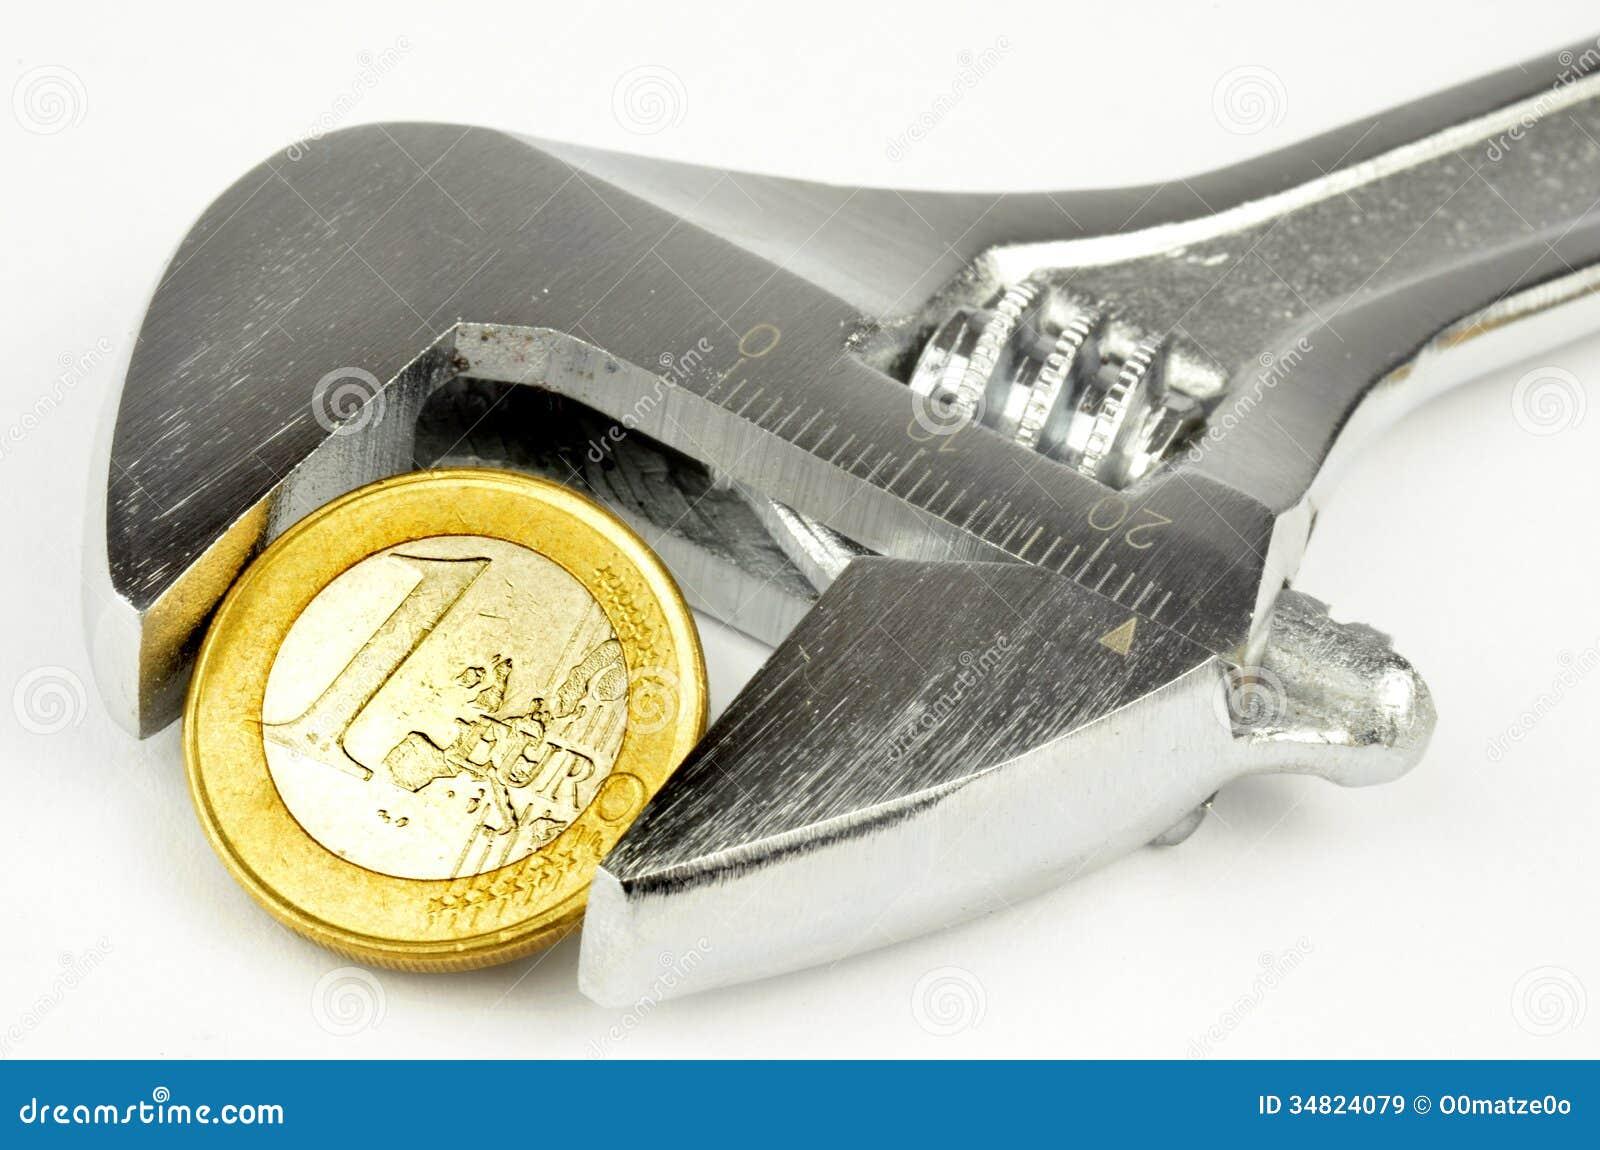 the european economic crisis a global The european debt crisis and asia in global economic governance 9 february 2013 authors: jochen prantl, nus, and petr blizkovsky, consilium asia and.